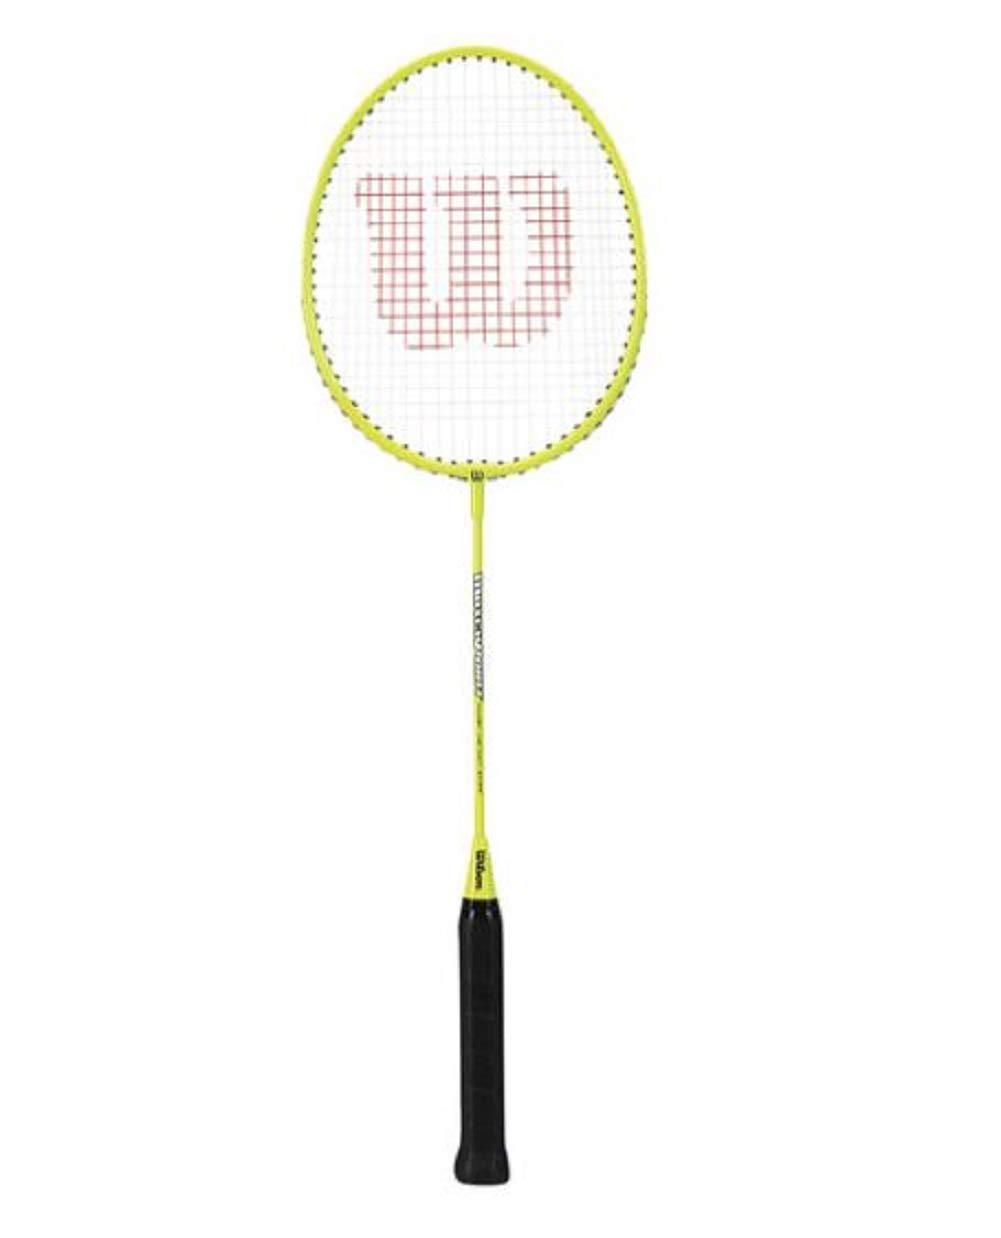 Wilson Matchpoint Badminton Racket, Yellow, 660 mm